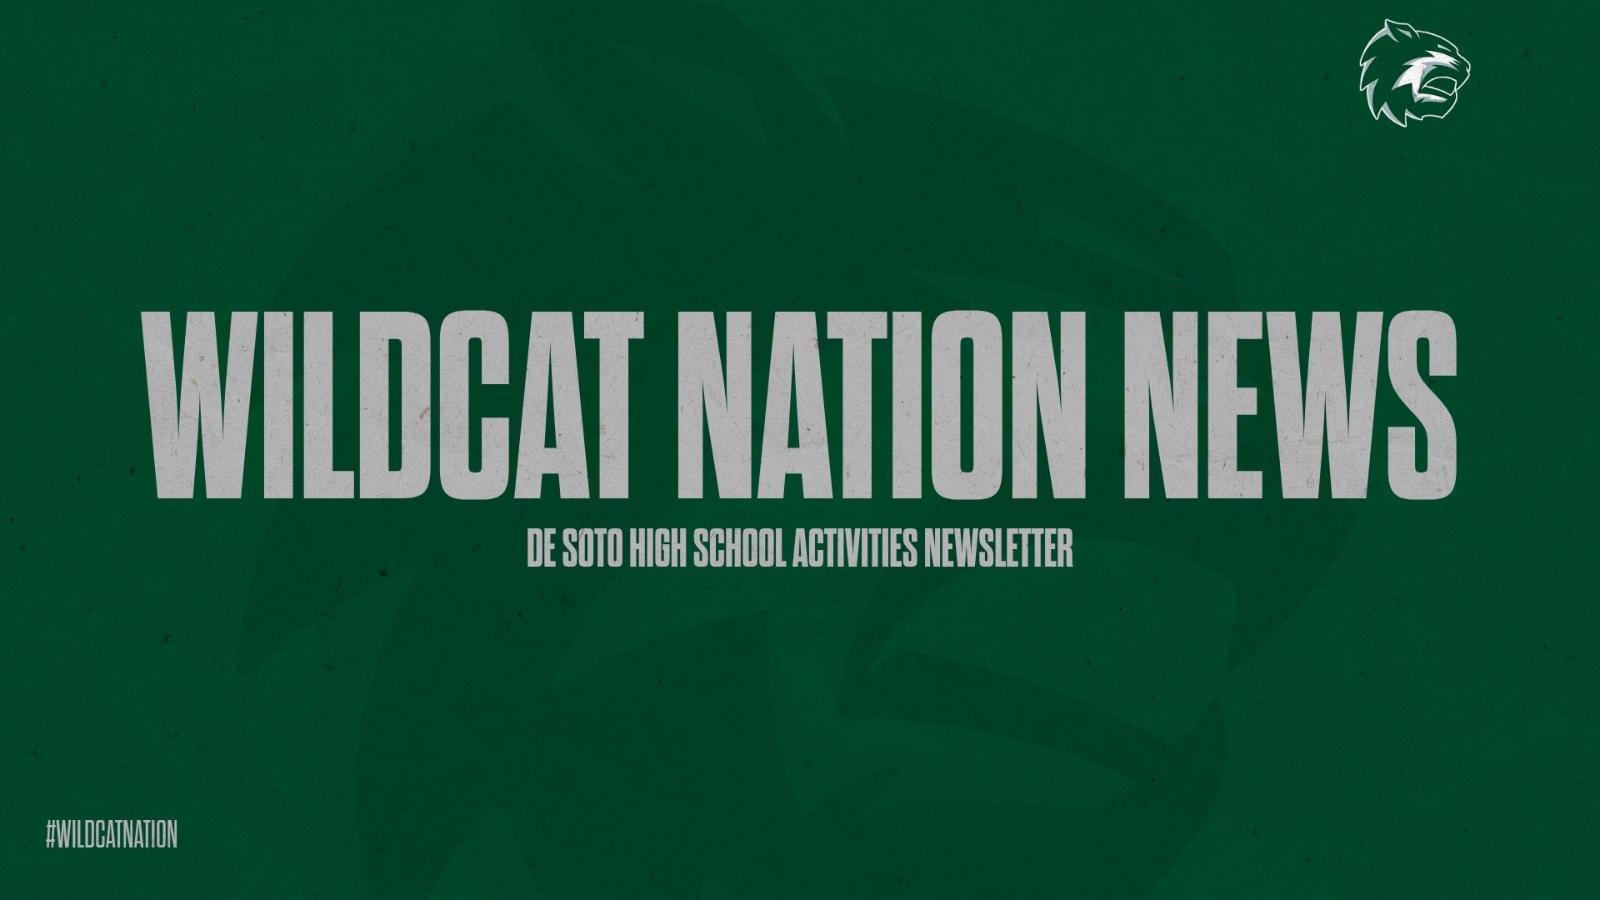 Wildcat Nation News 9.28.20